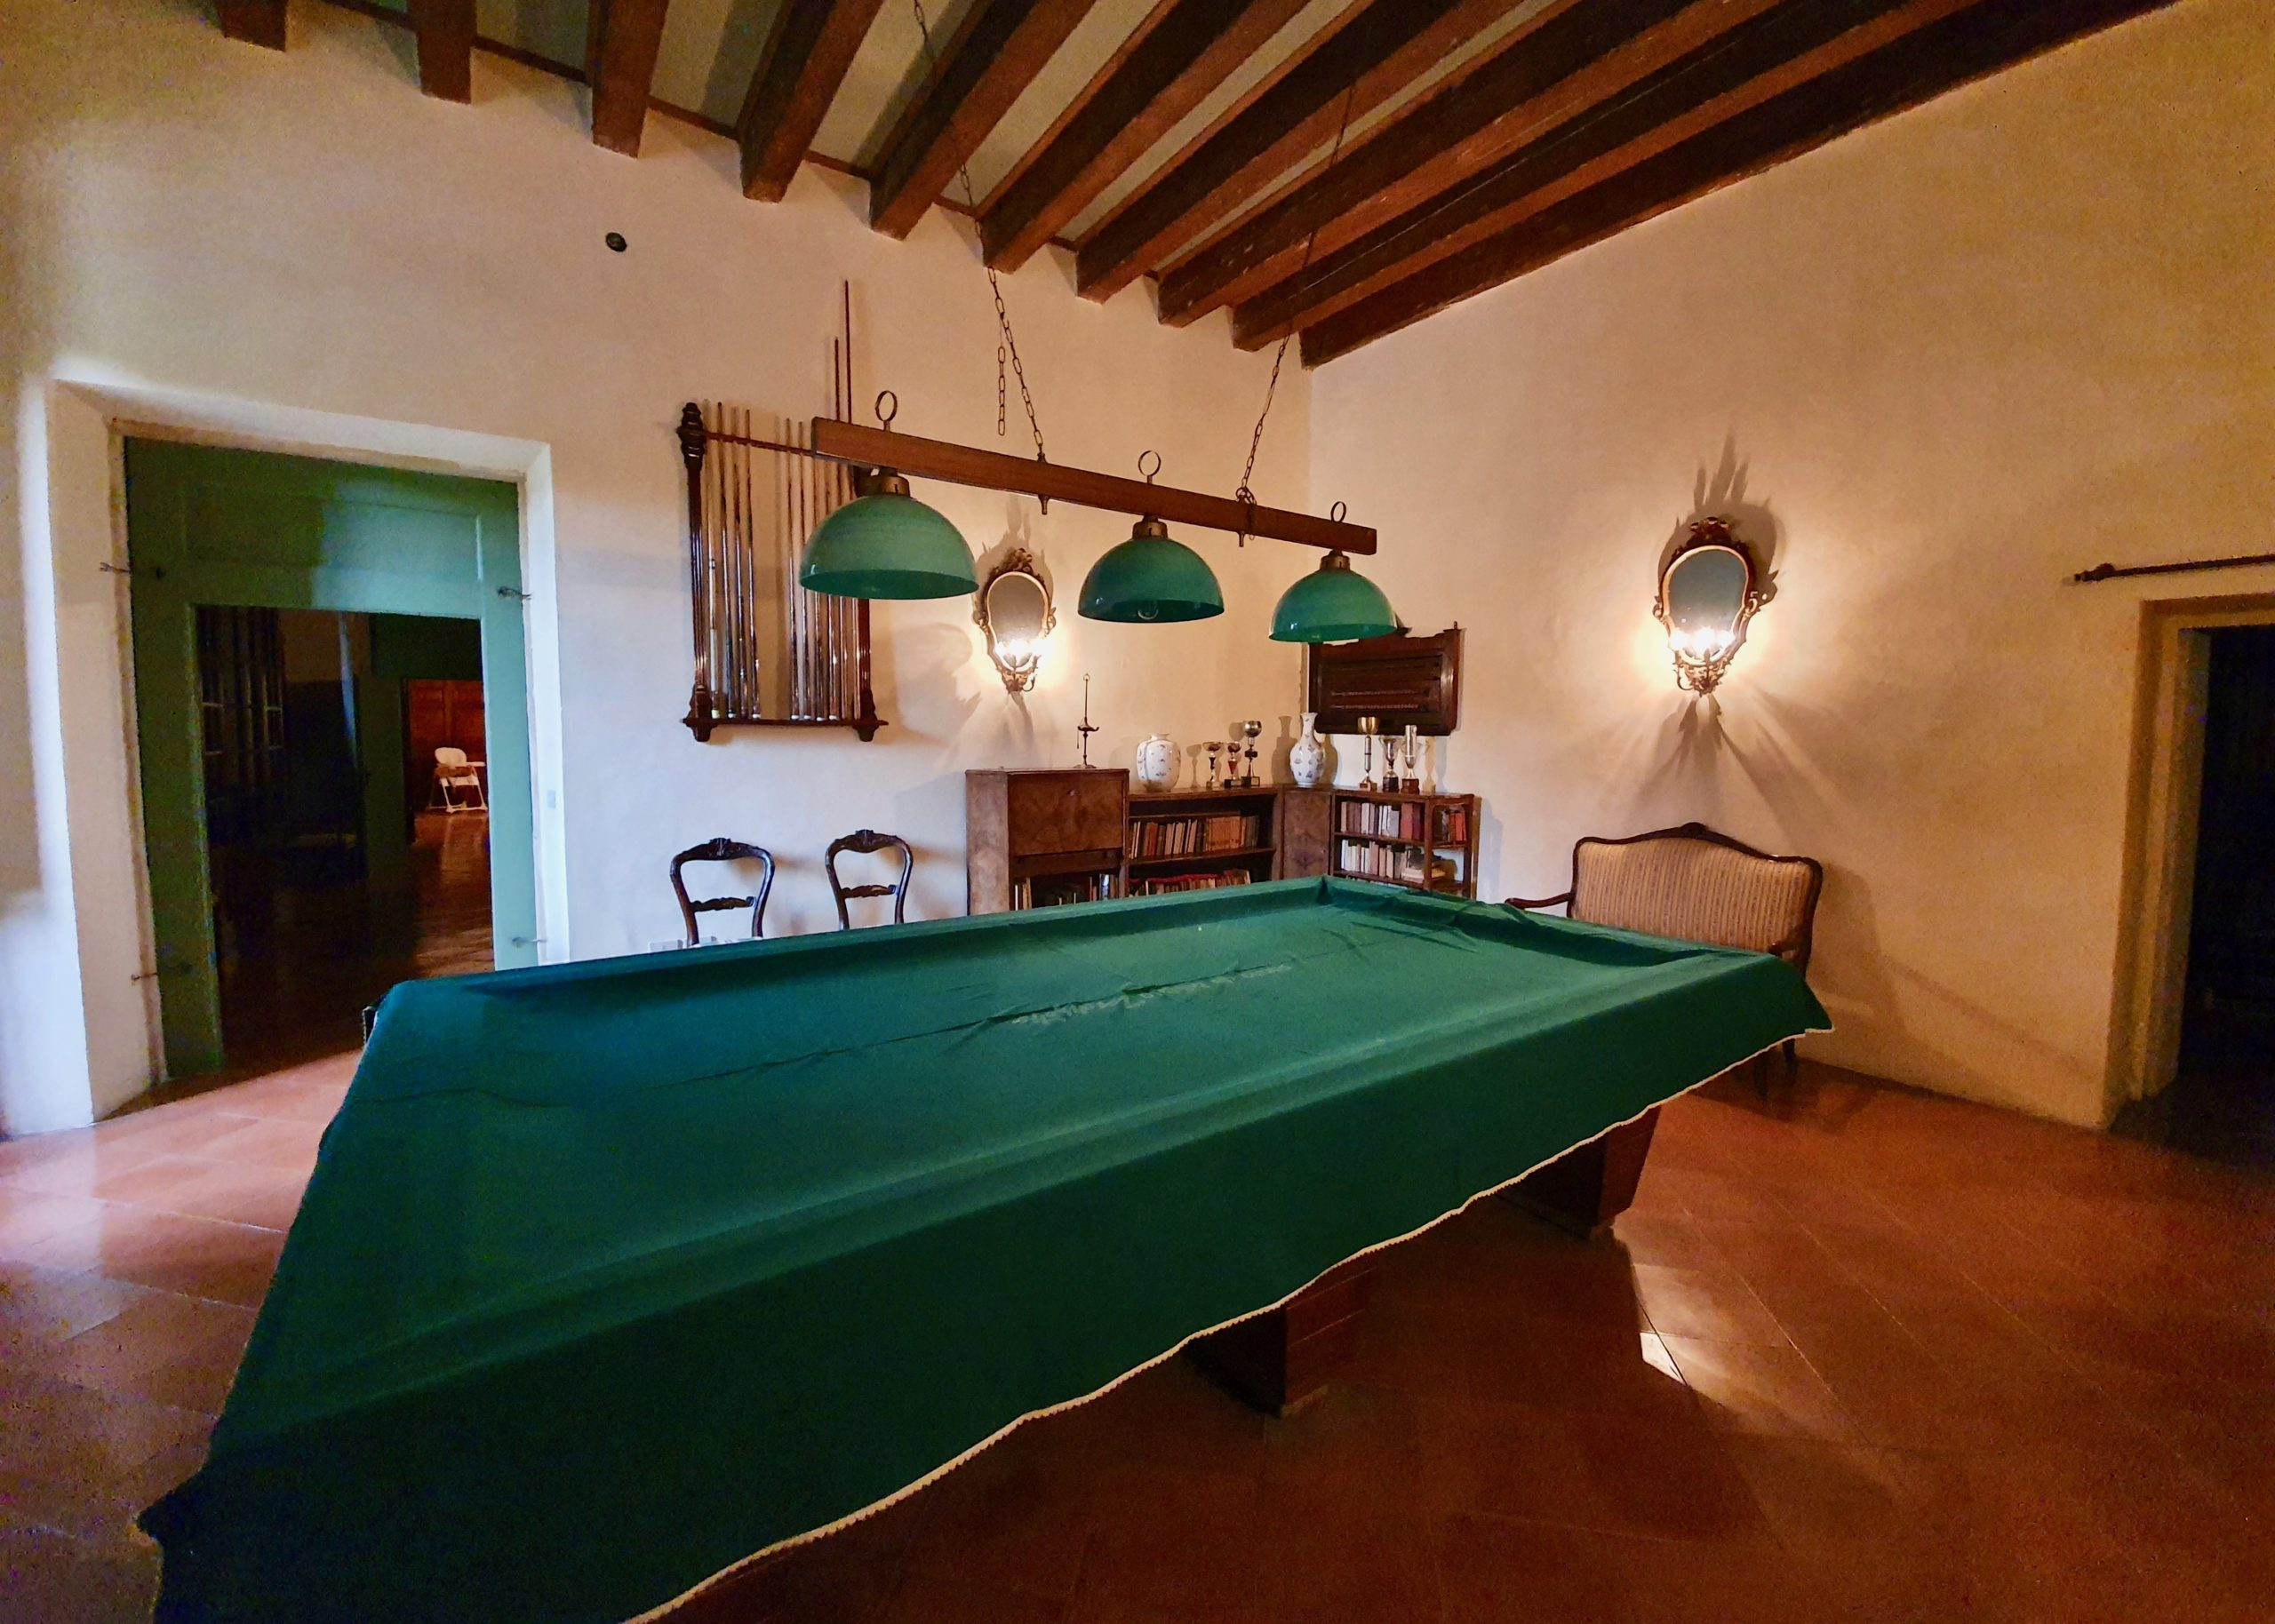 Billiard room at Villa Maffei Rizzardi